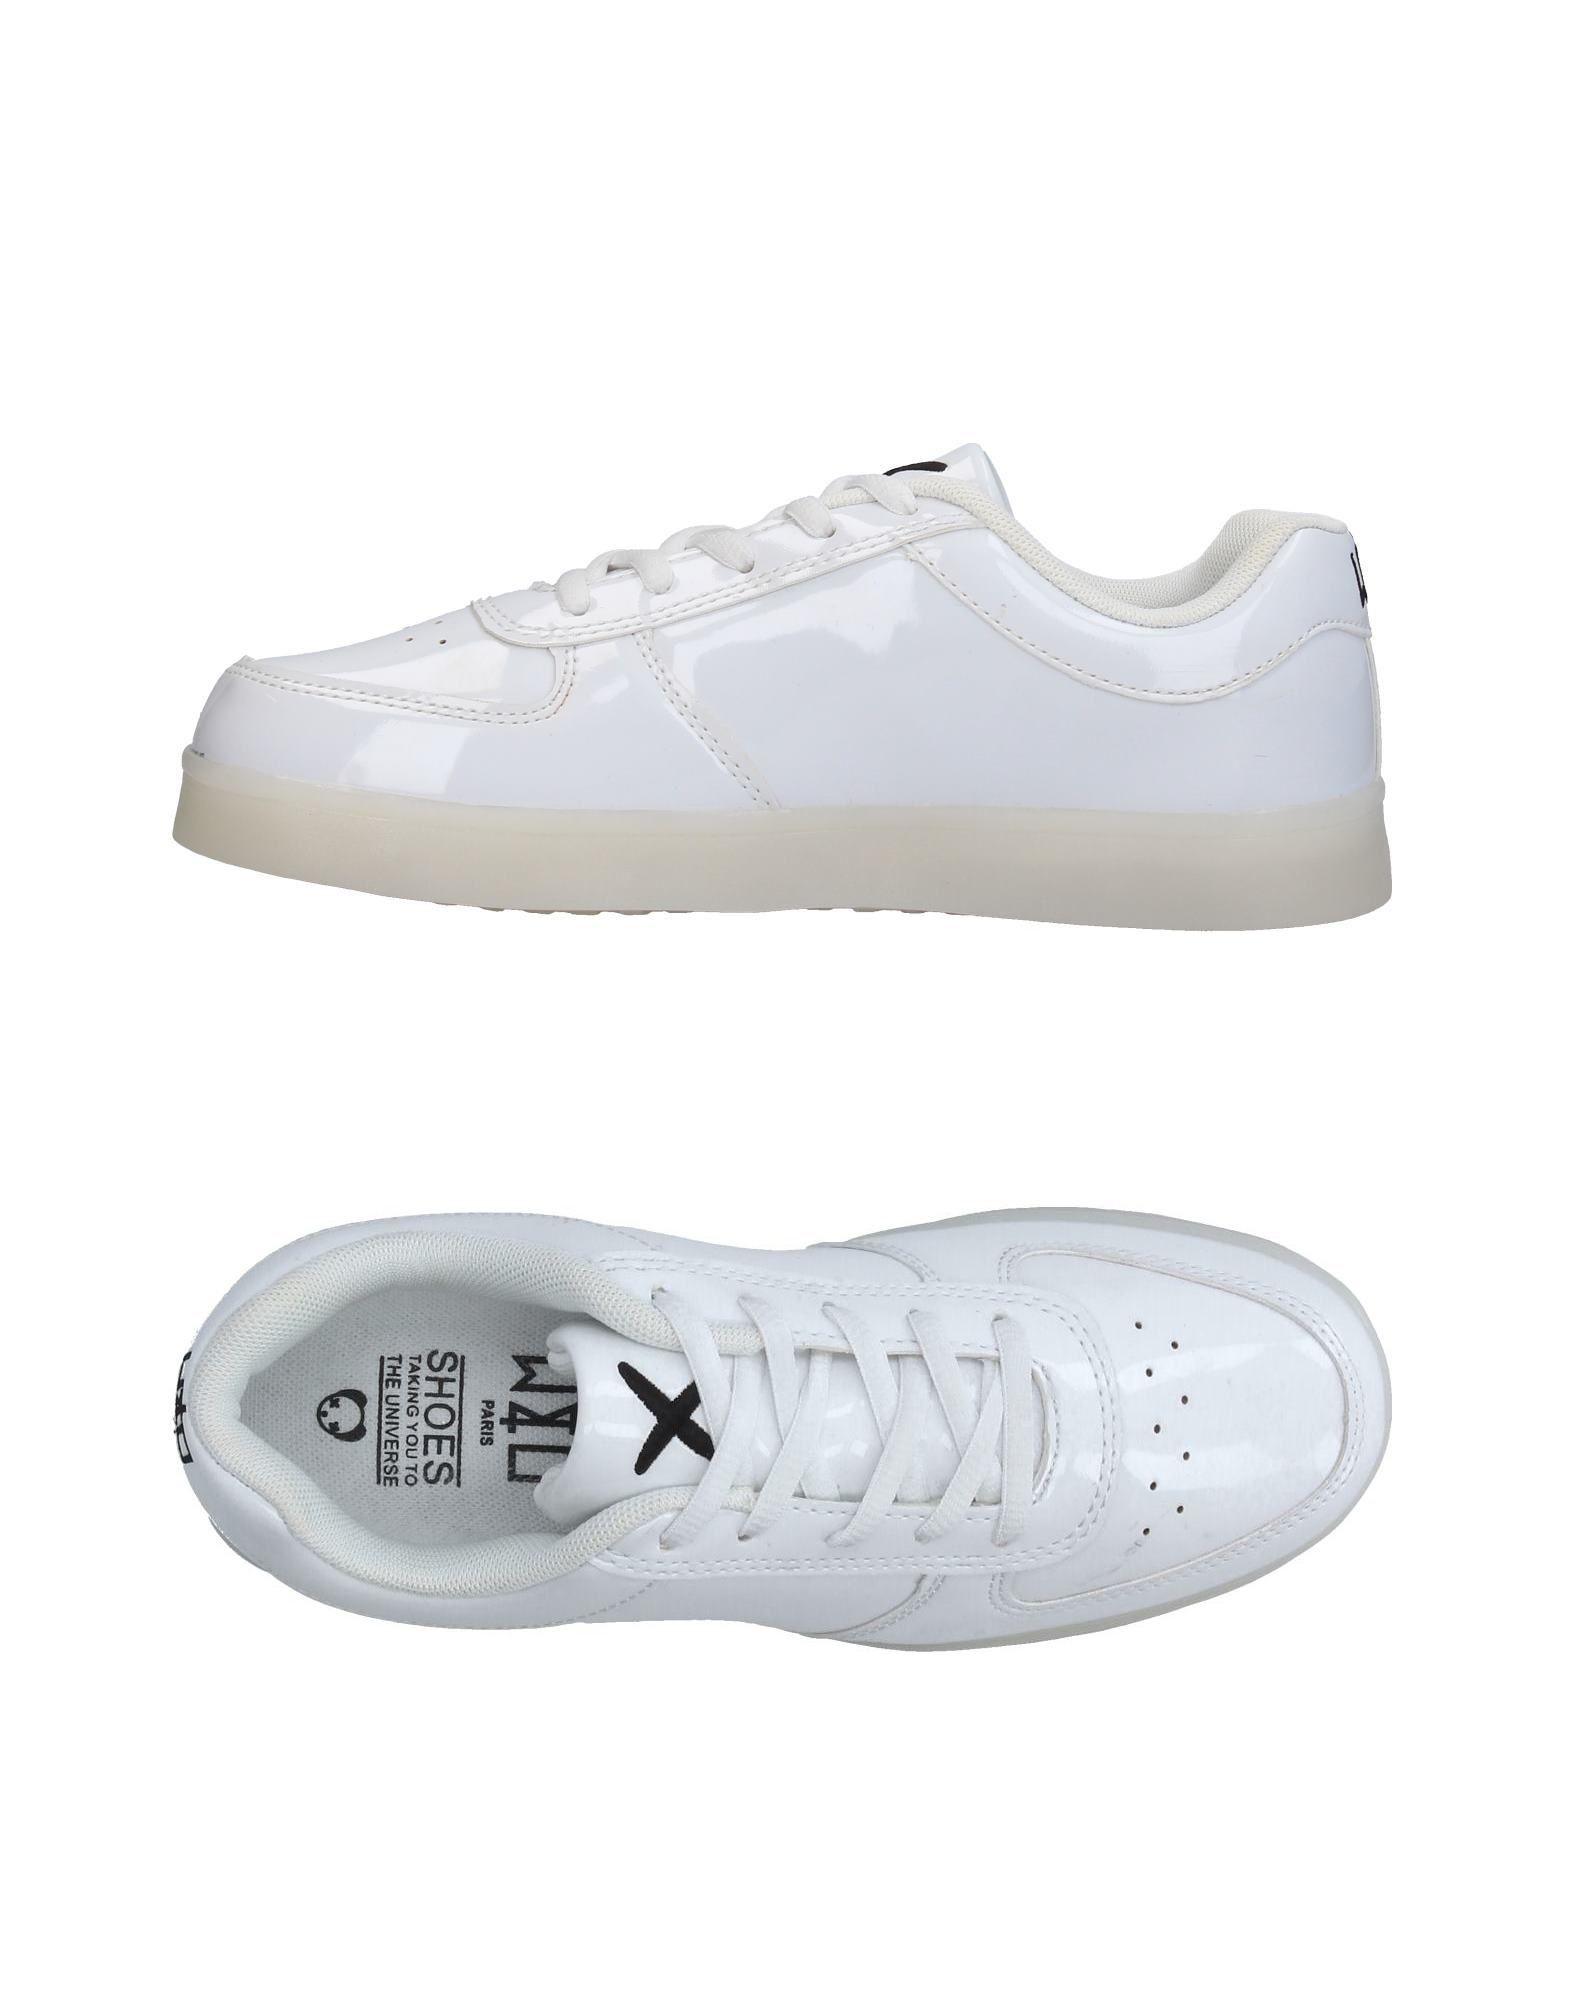 Wize & Ope Sneakers Damen  11360980TU Gute Qualität beliebte Schuhe